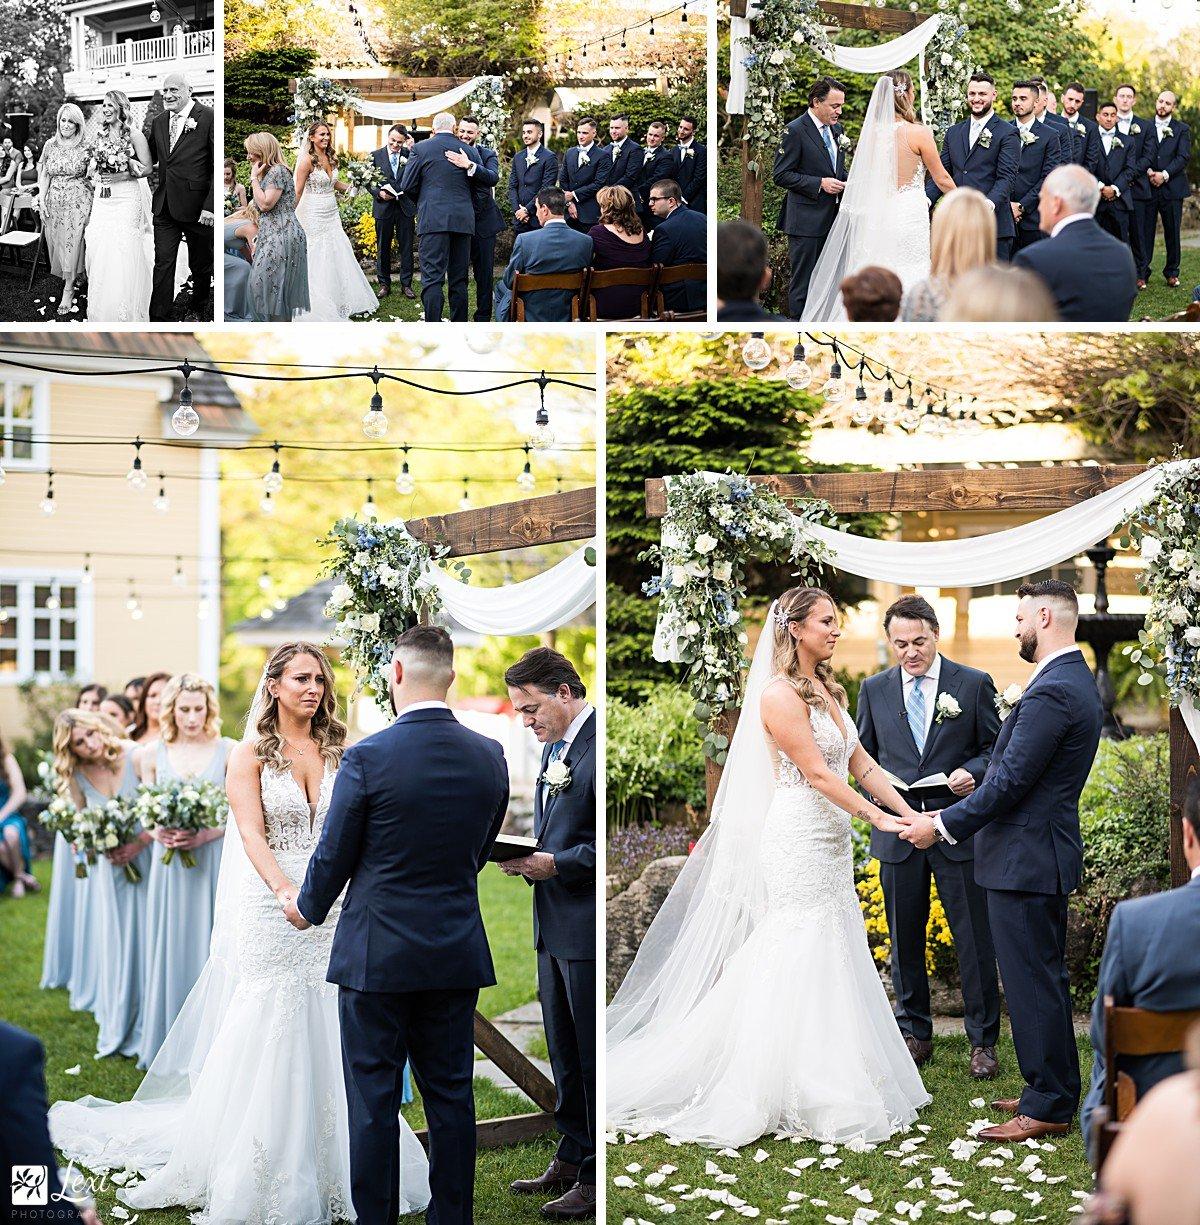 bedford-village-inn-wedding_outdoor-ceremony.jpg